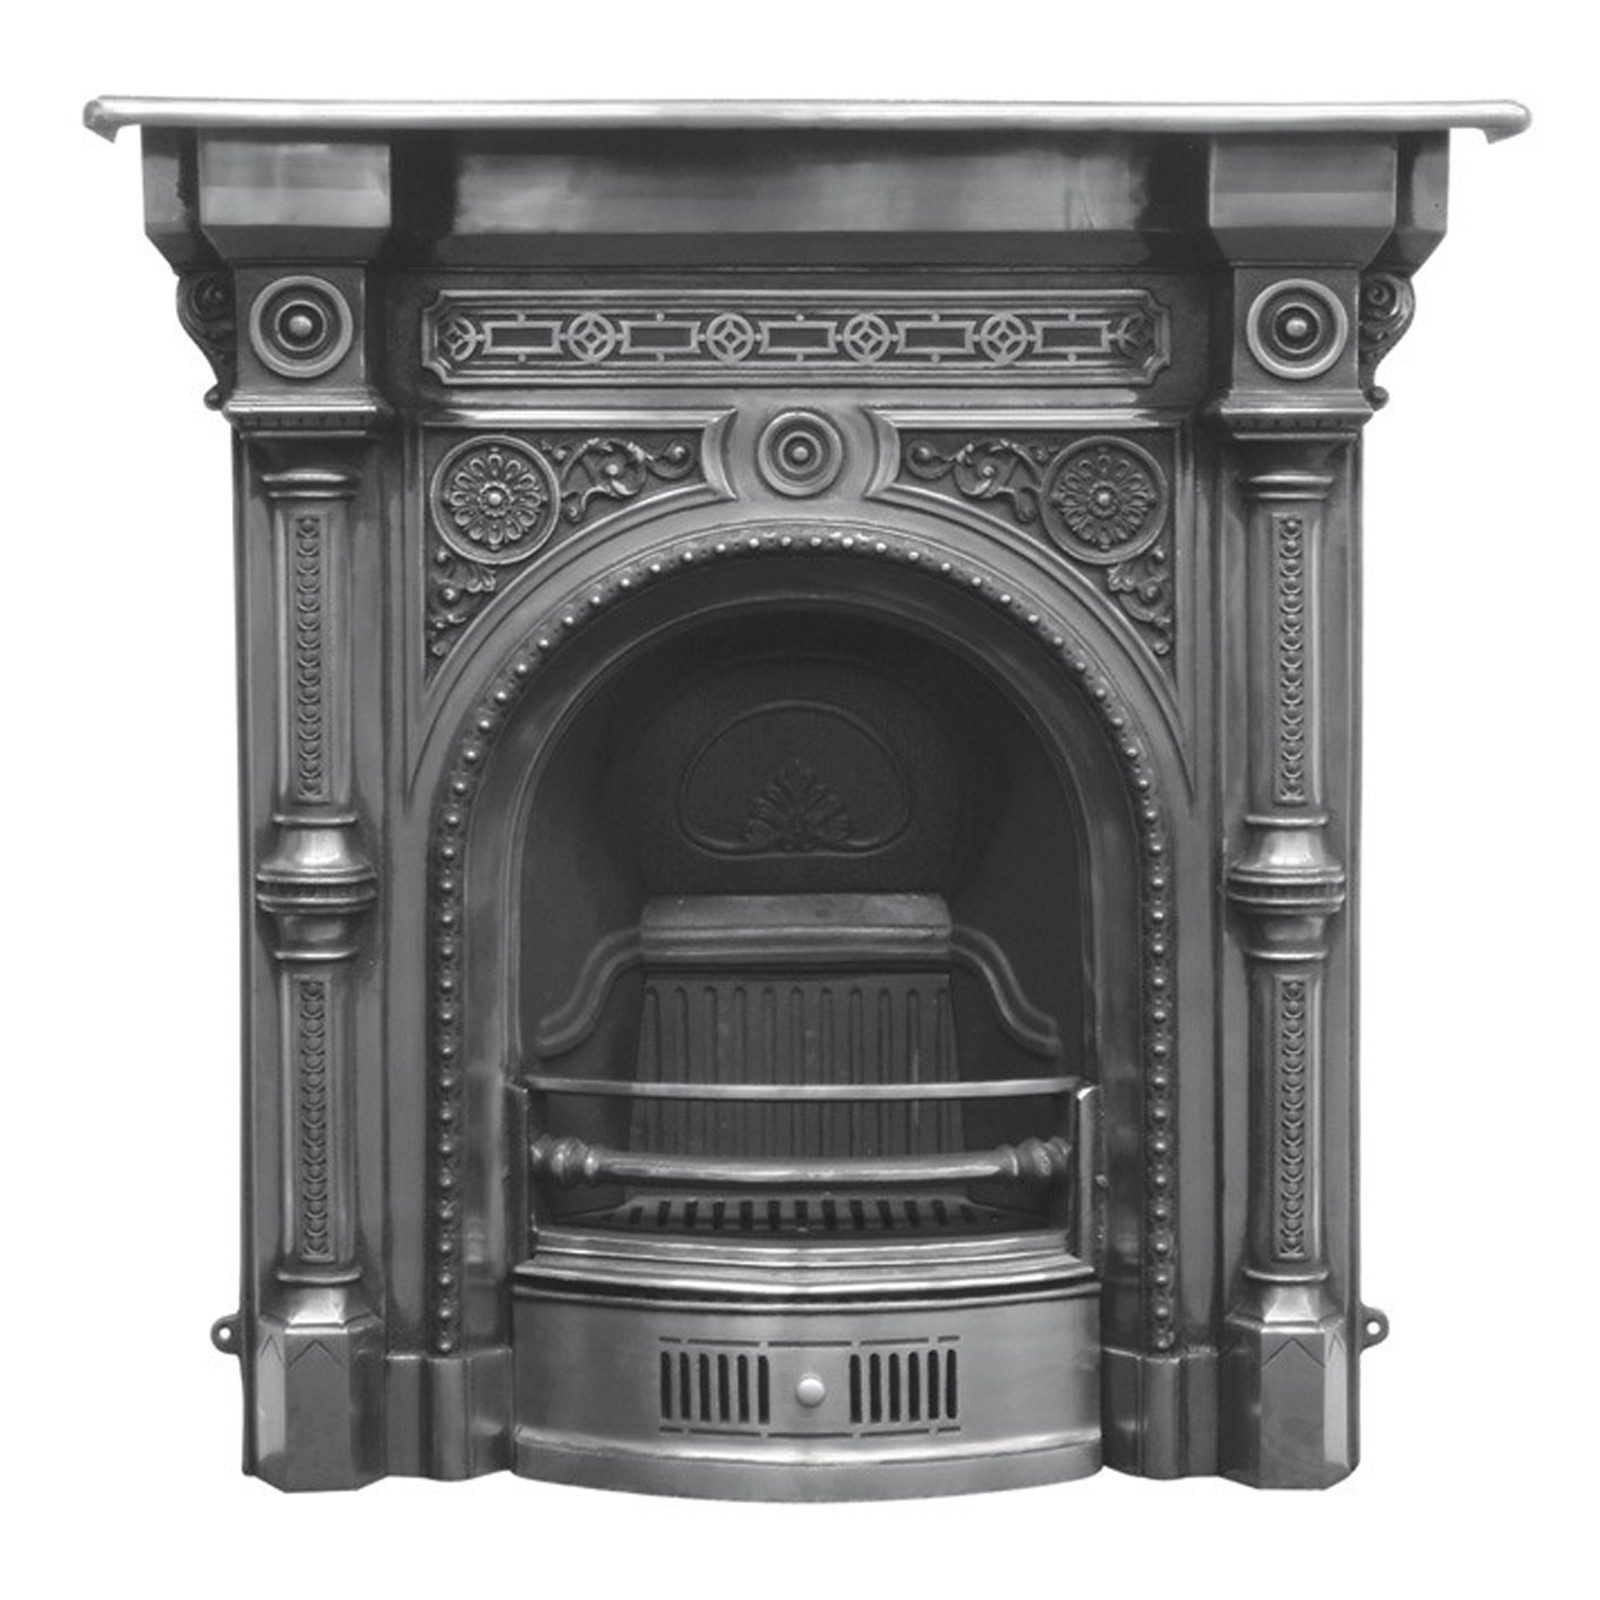 opus irons set tool fire products ferrari fireplace ferrum focus